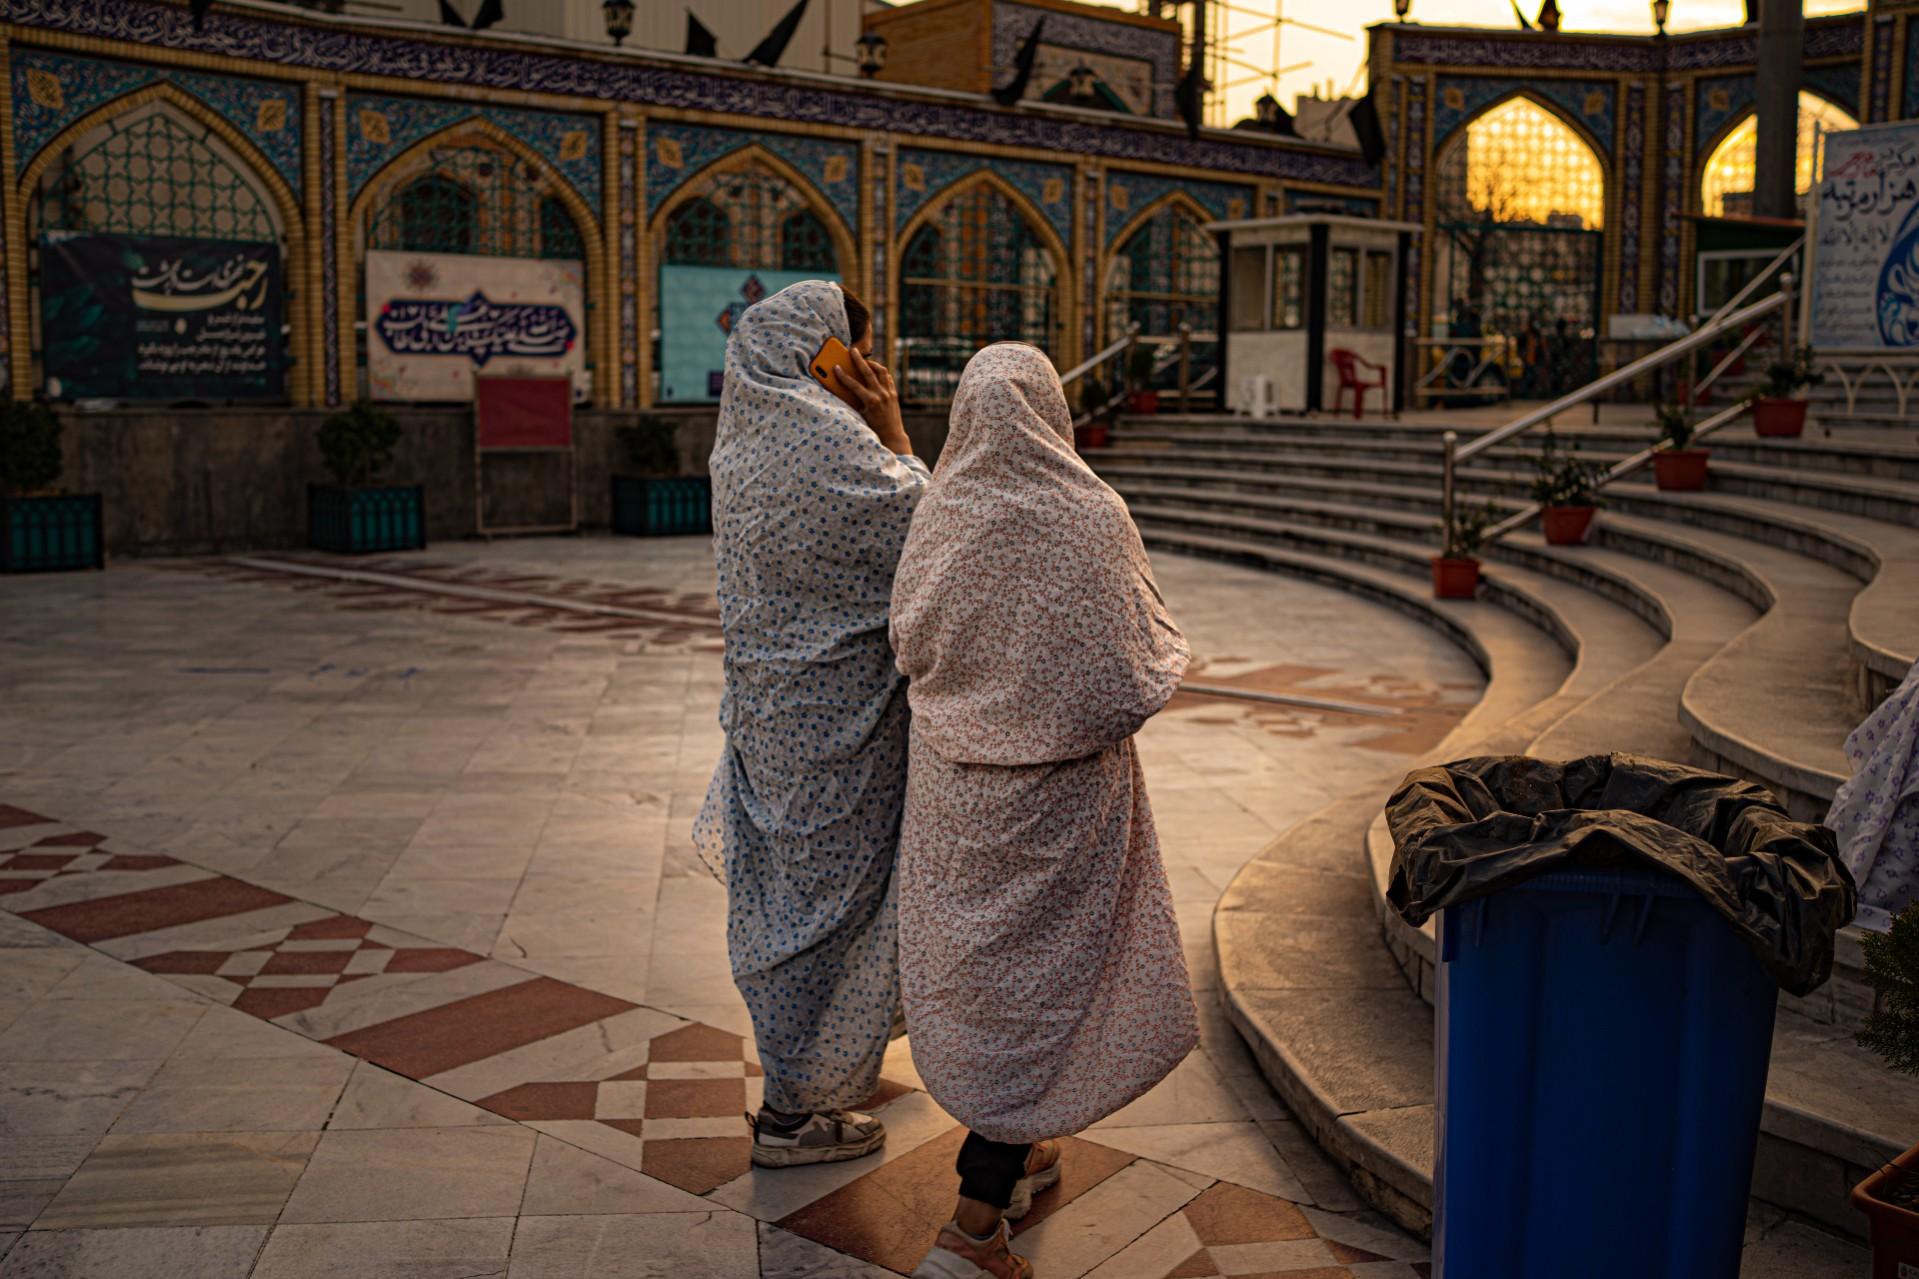 Dua perempuan di masjid.